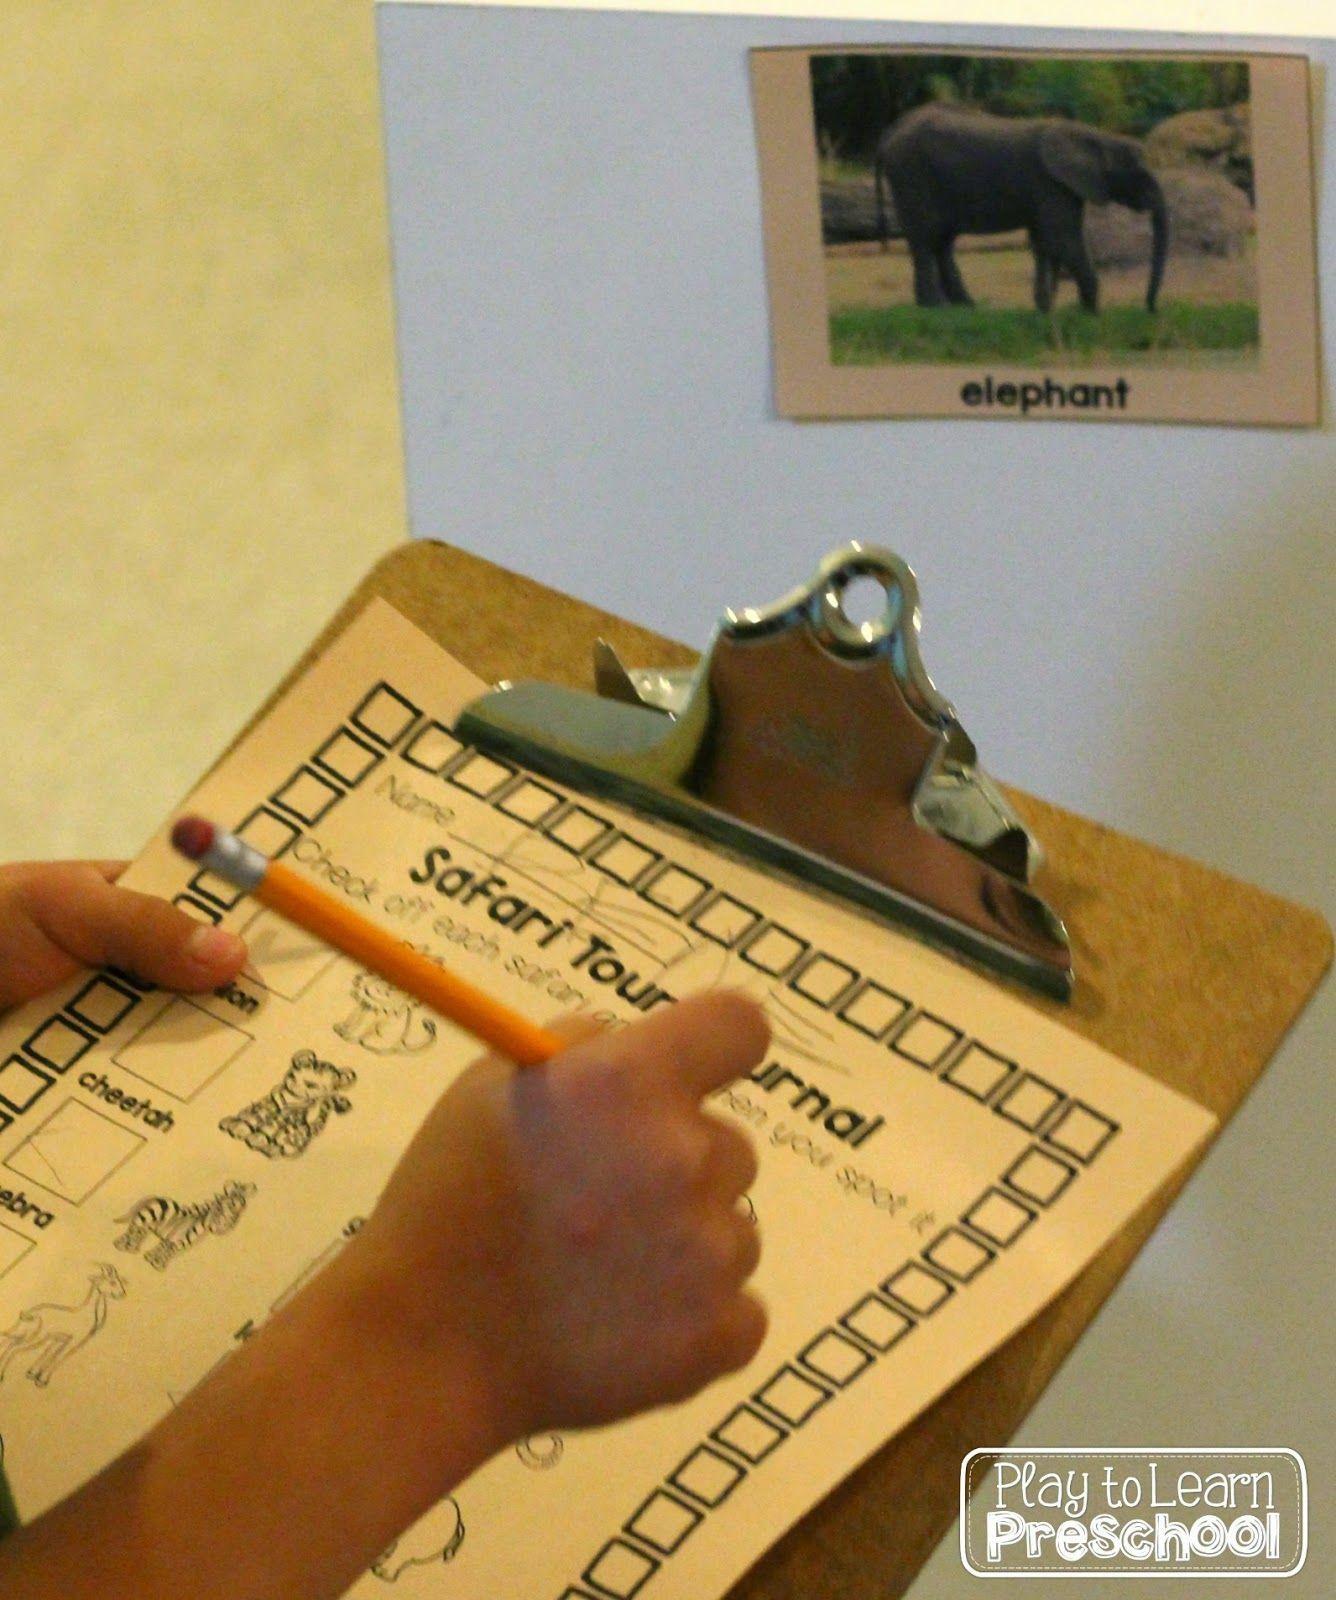 Take your Students on a Wild Classroom Safari, Take your Students on a Wild Classroom Safari,